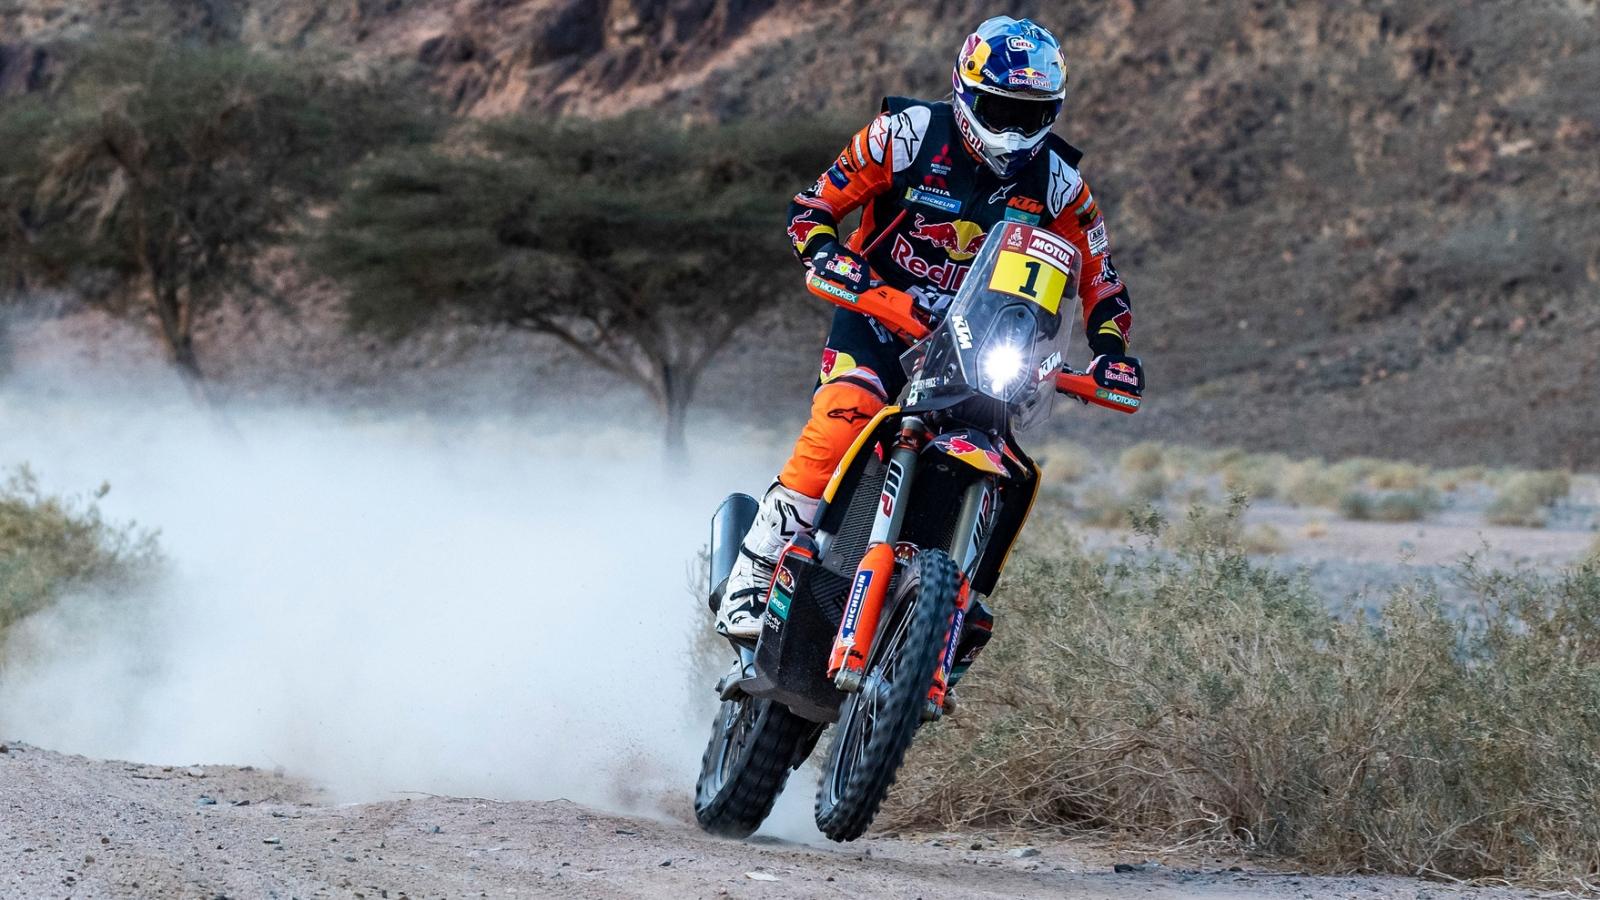 Dakar 2020: Toby Price gana, Ricky Brabec es más líder y Sam Sunderland abandona